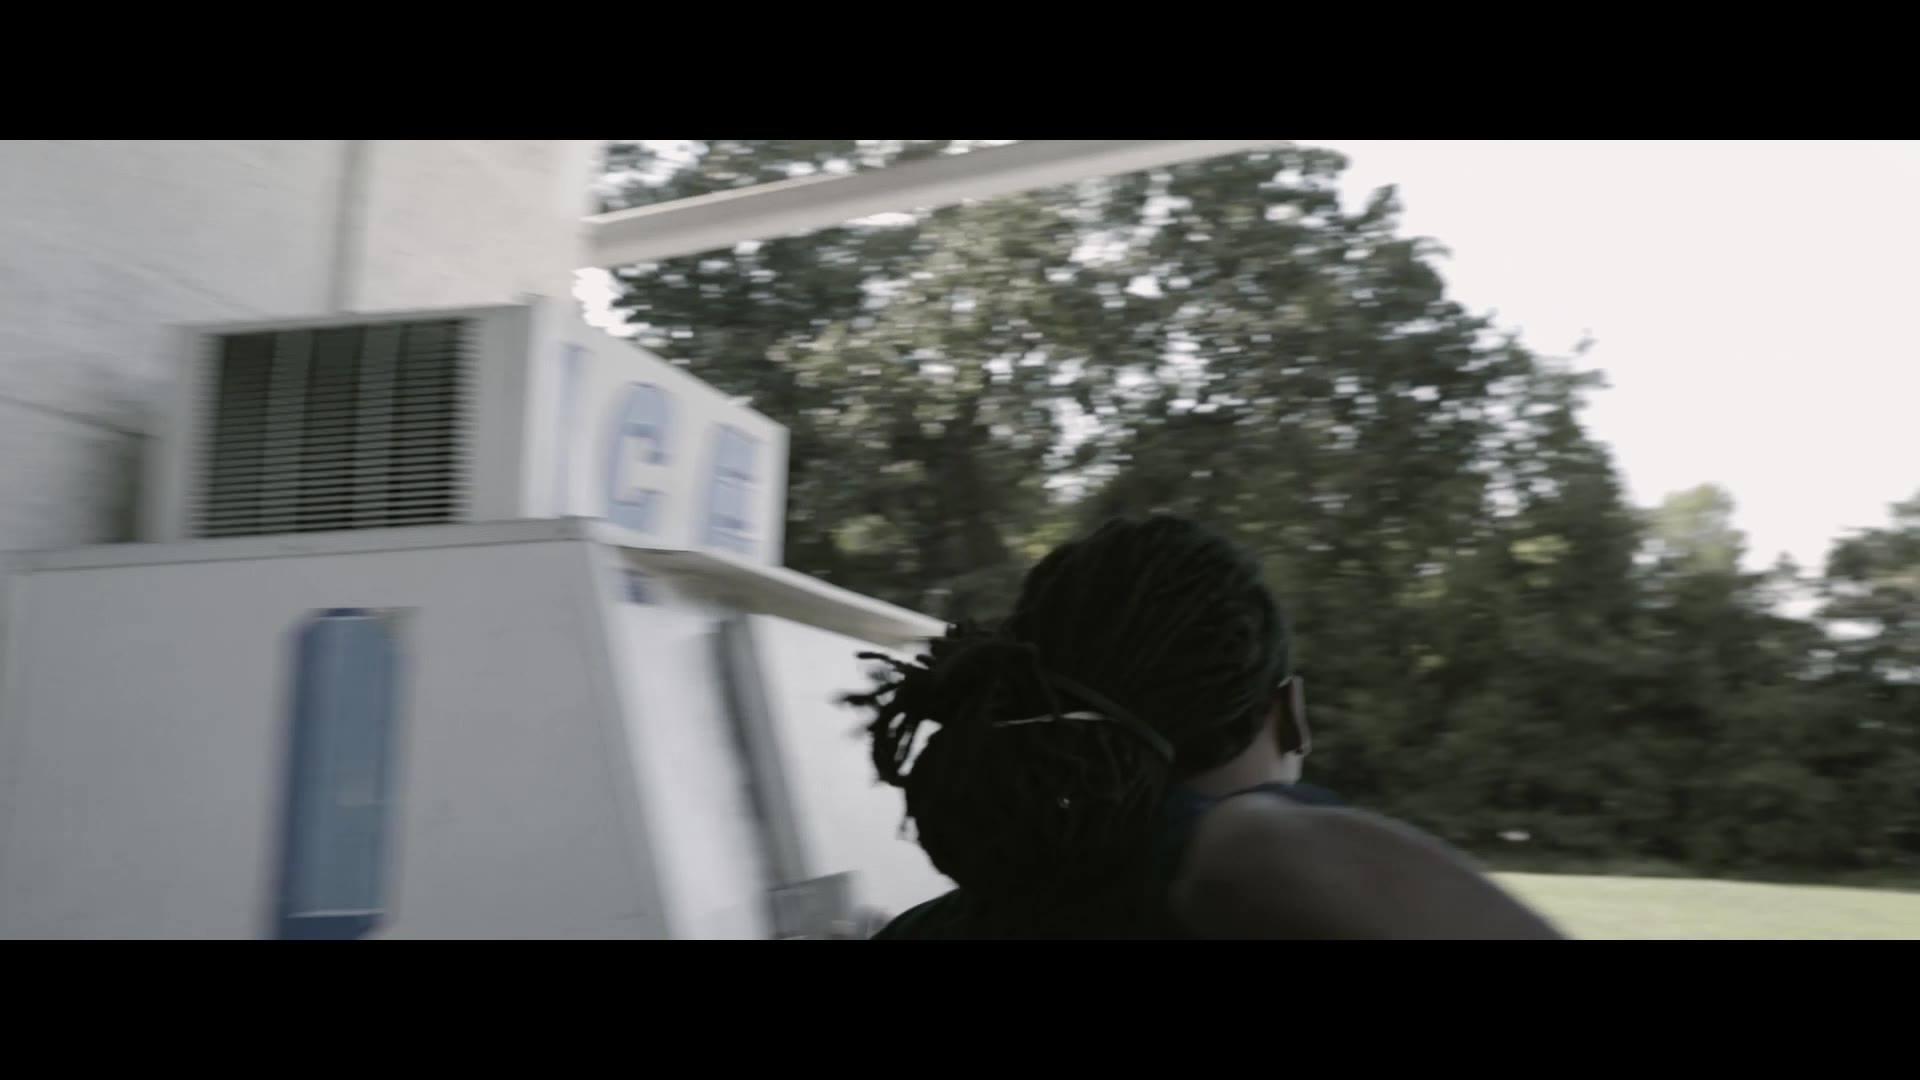 P.I.T - I Swear ft. Esquire Prod. By CLVSSIC Shot By Karltinbankz 🔥🔥🔥🔥🔥🔥🔥🔥 Global Money Entertainment 🌍💰